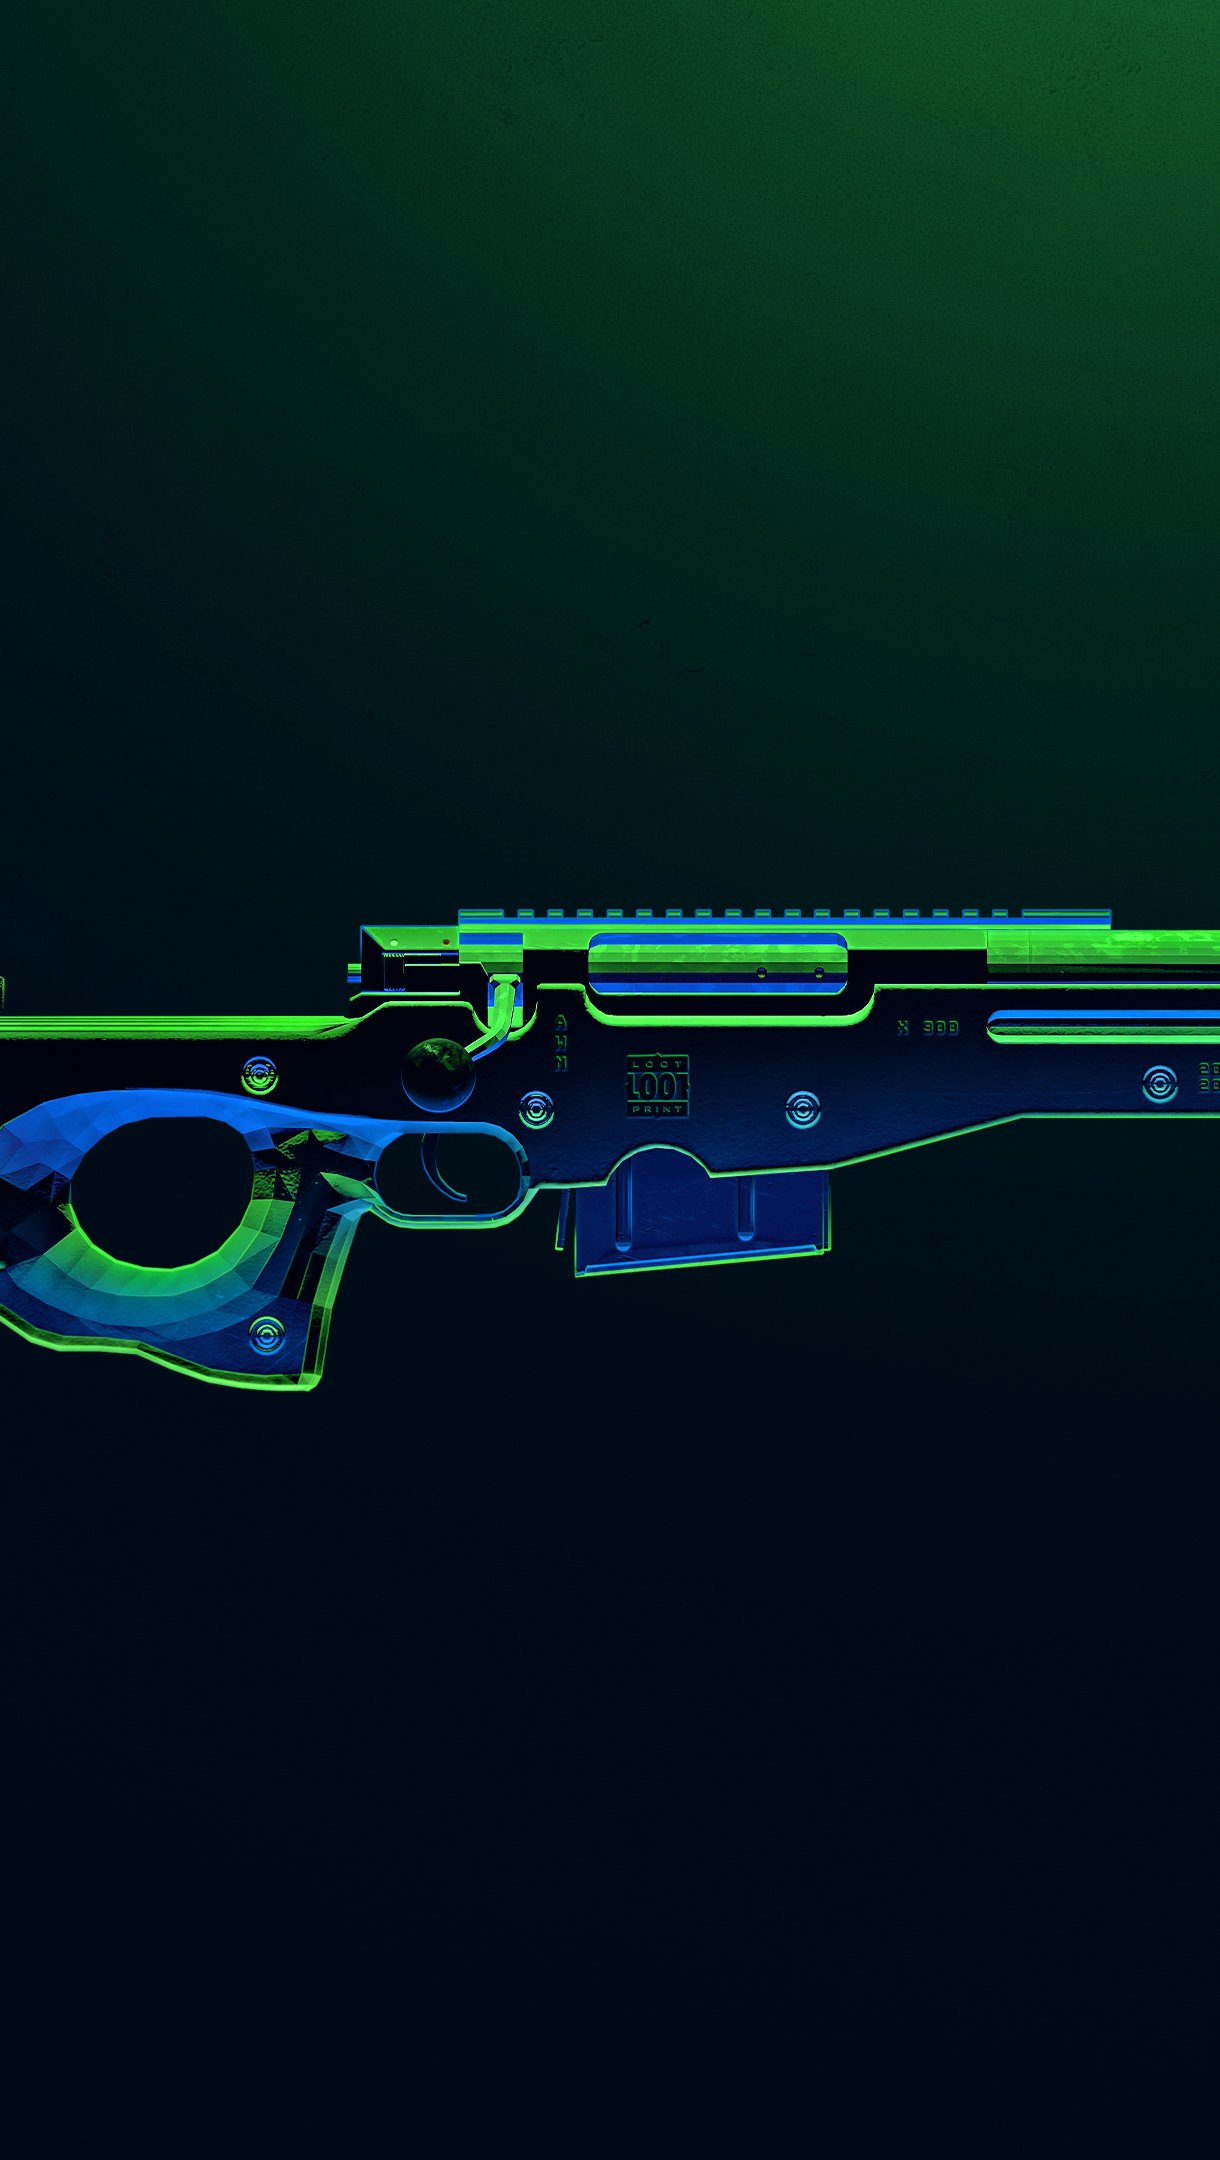 Wallpaper PUBG AWM Weapon Vertical